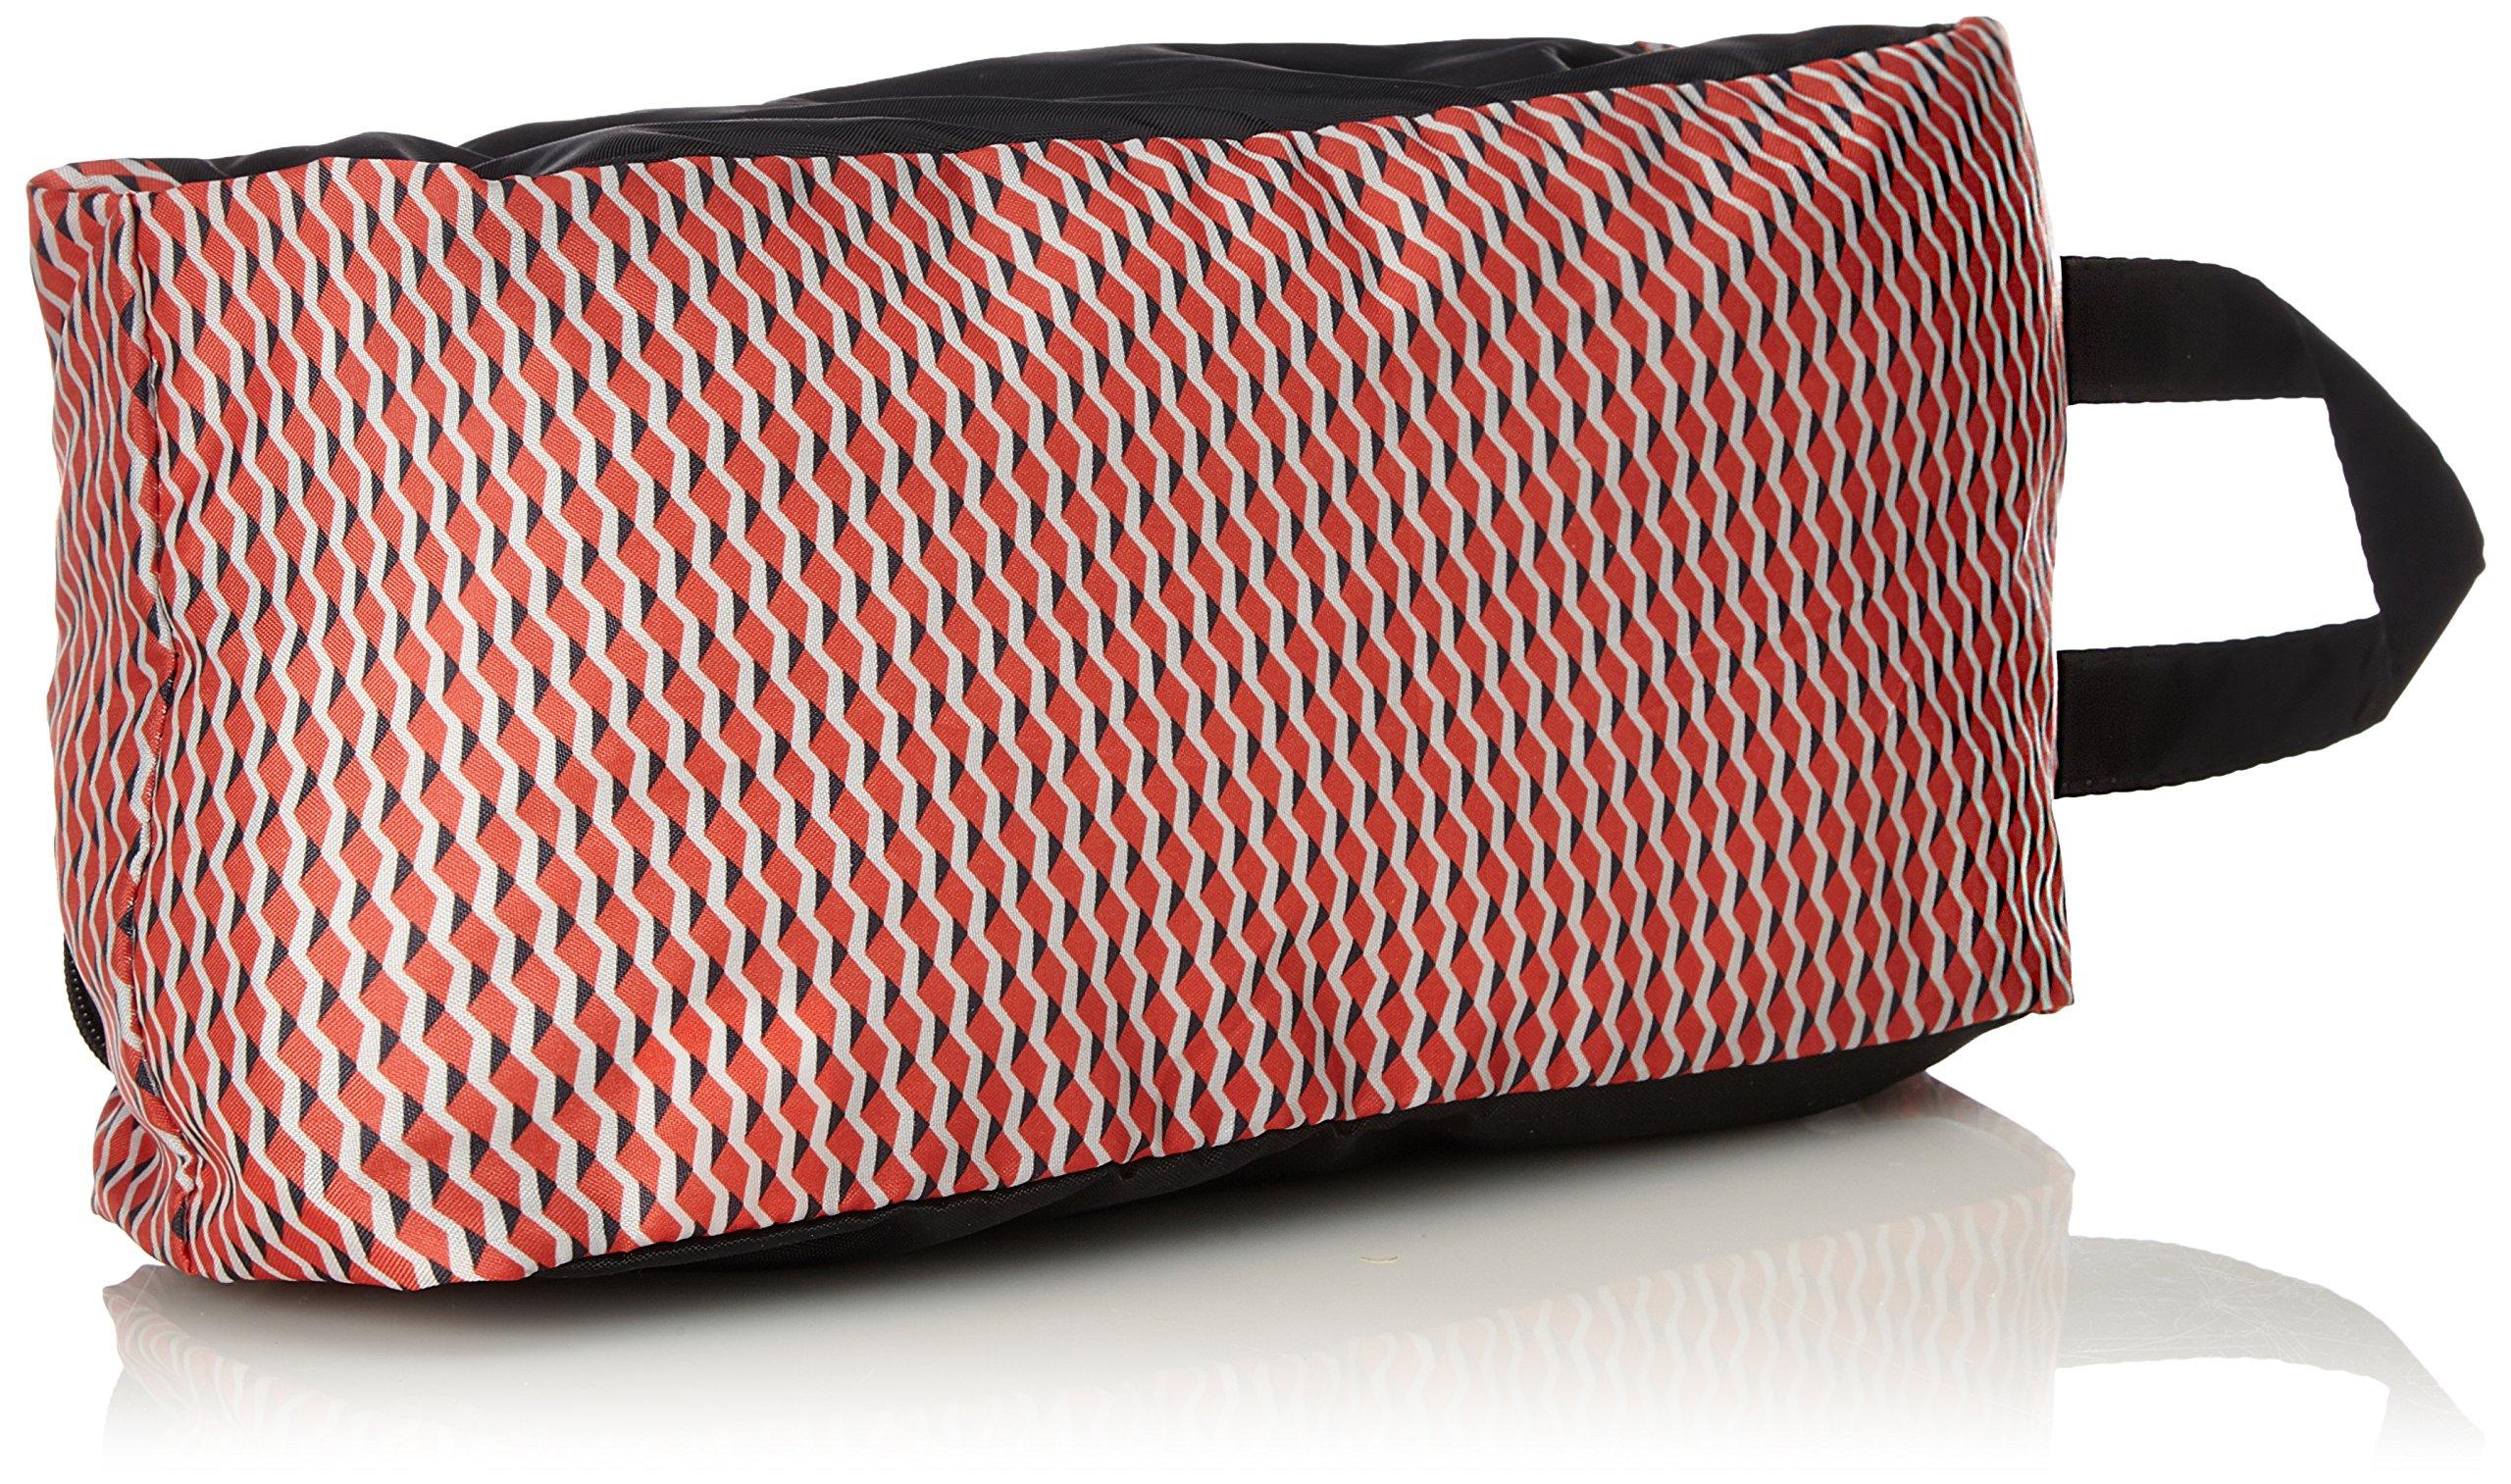 9155P8deynL - Kipling Wearable S Organizador para Maletas, 30 cm, 5 Liters, (Hybrid Geo Red)